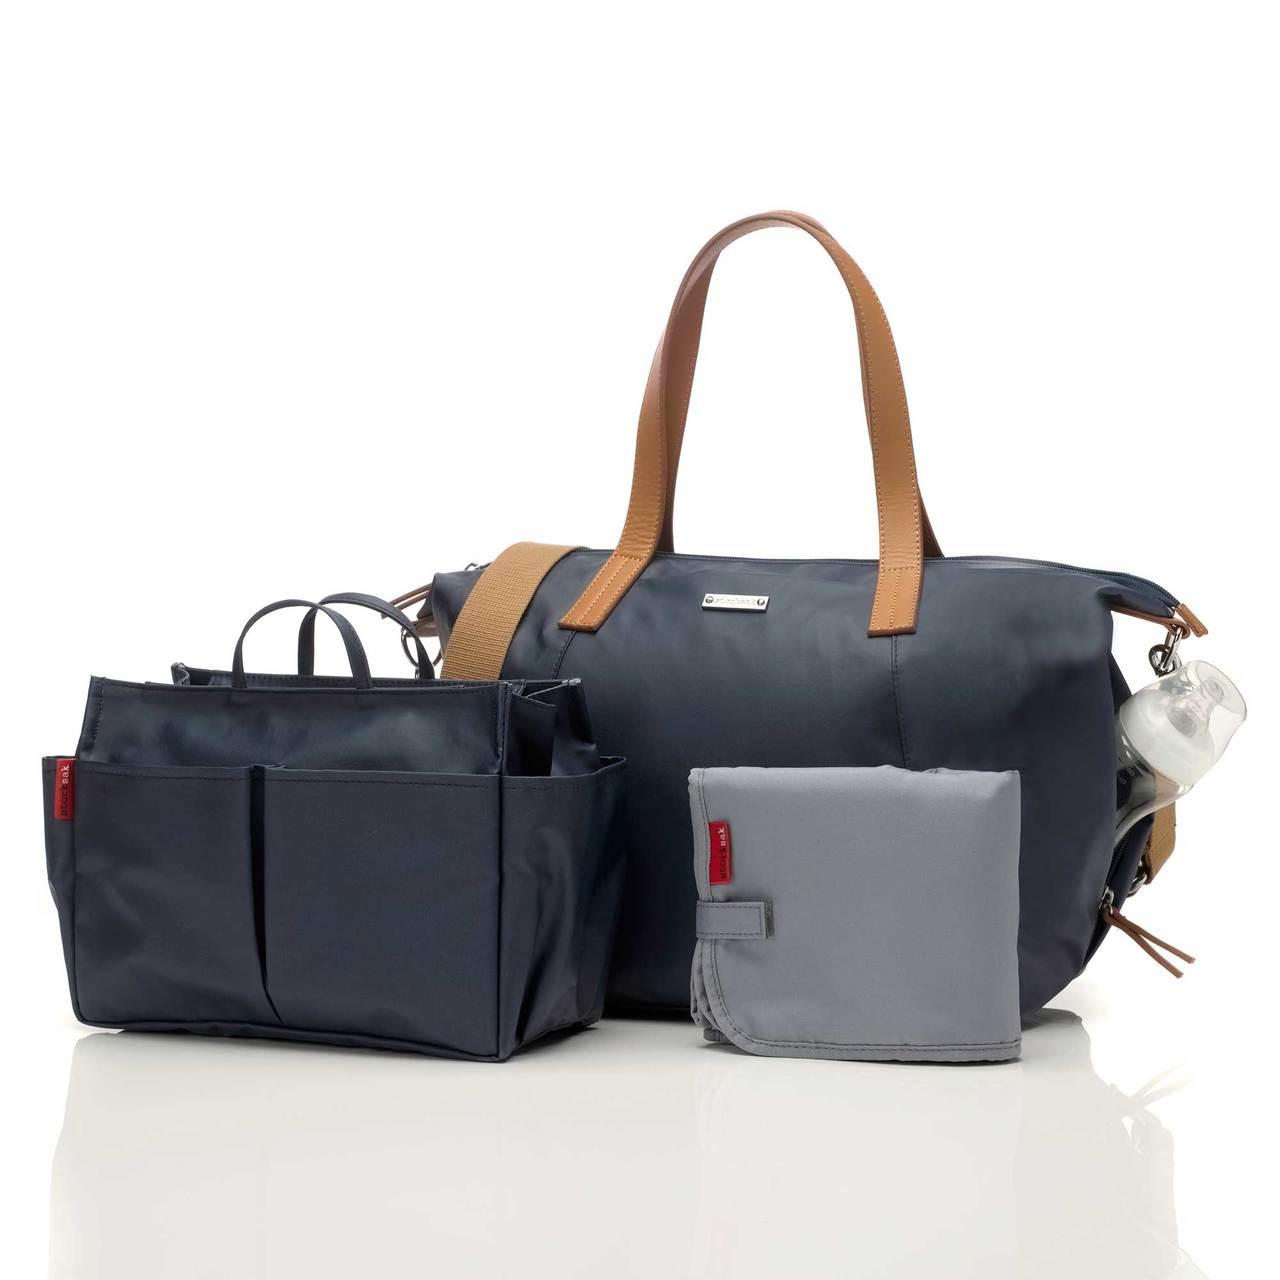 99cce1aaf436 Shop Storksak Diaper Baby Bags-Navy